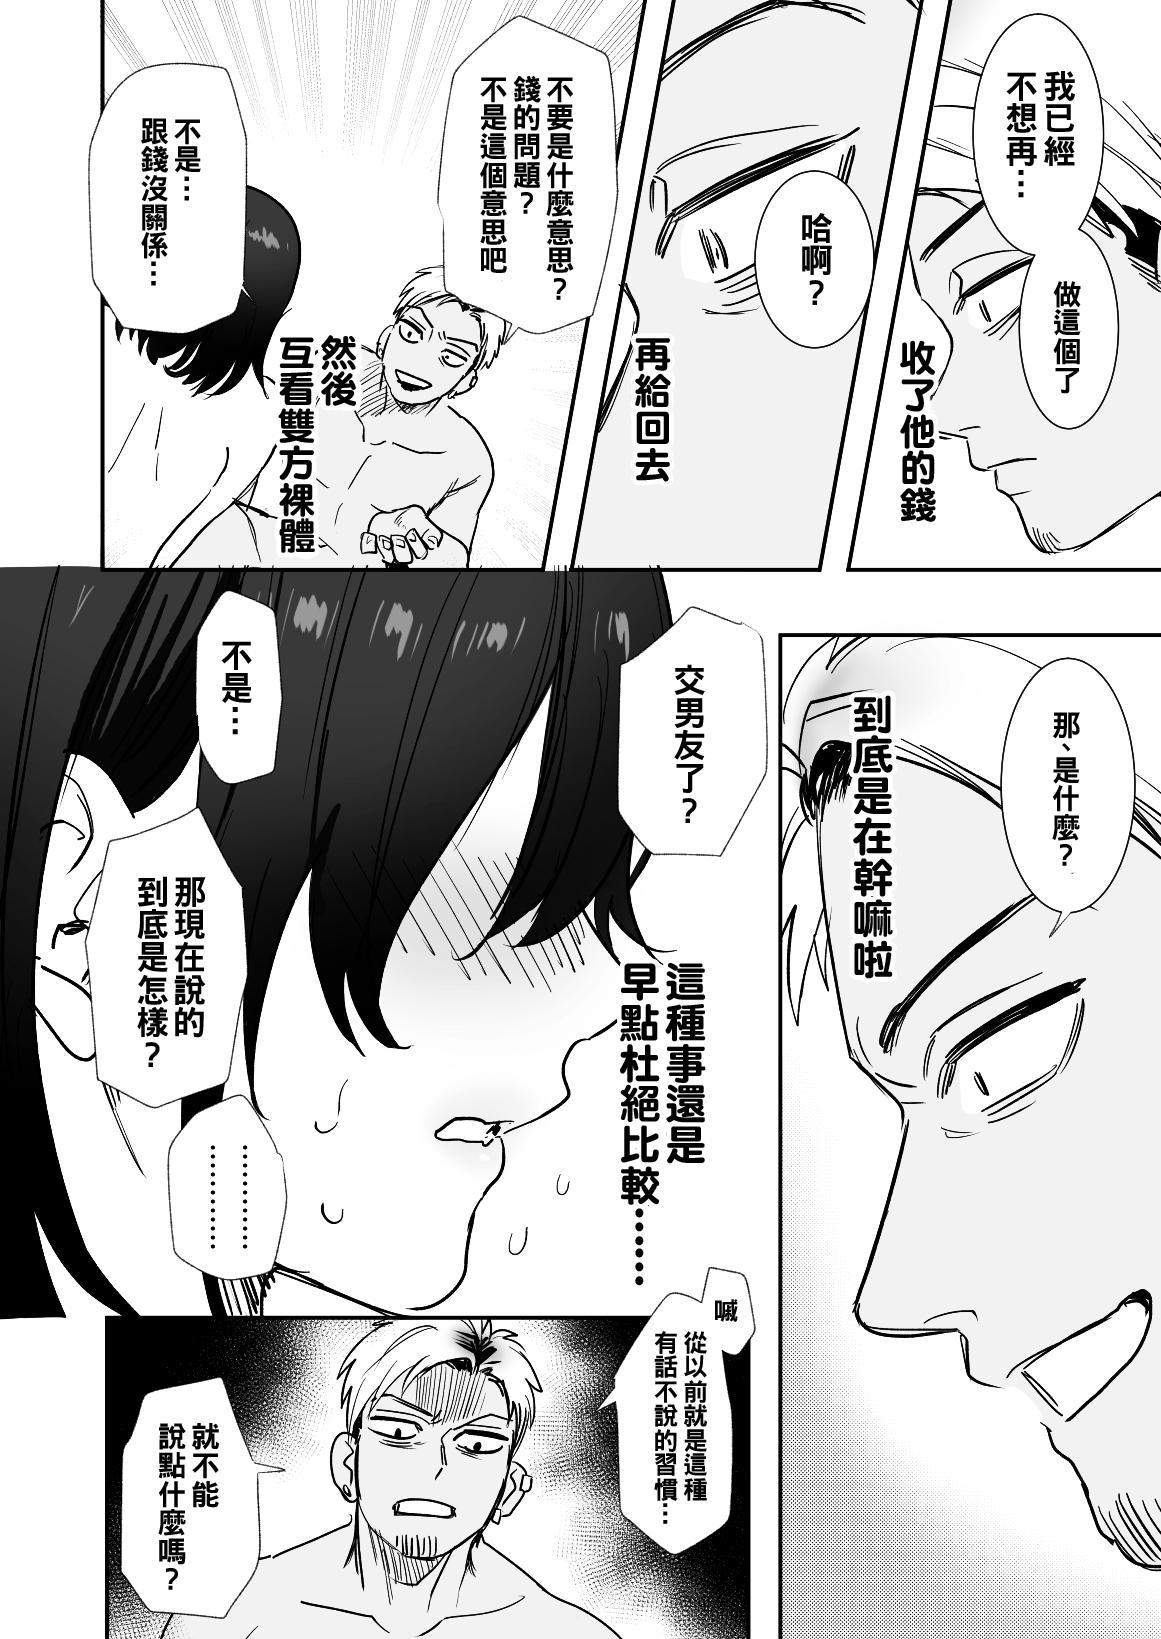 〇sen Yen de Oppai Misete. 25